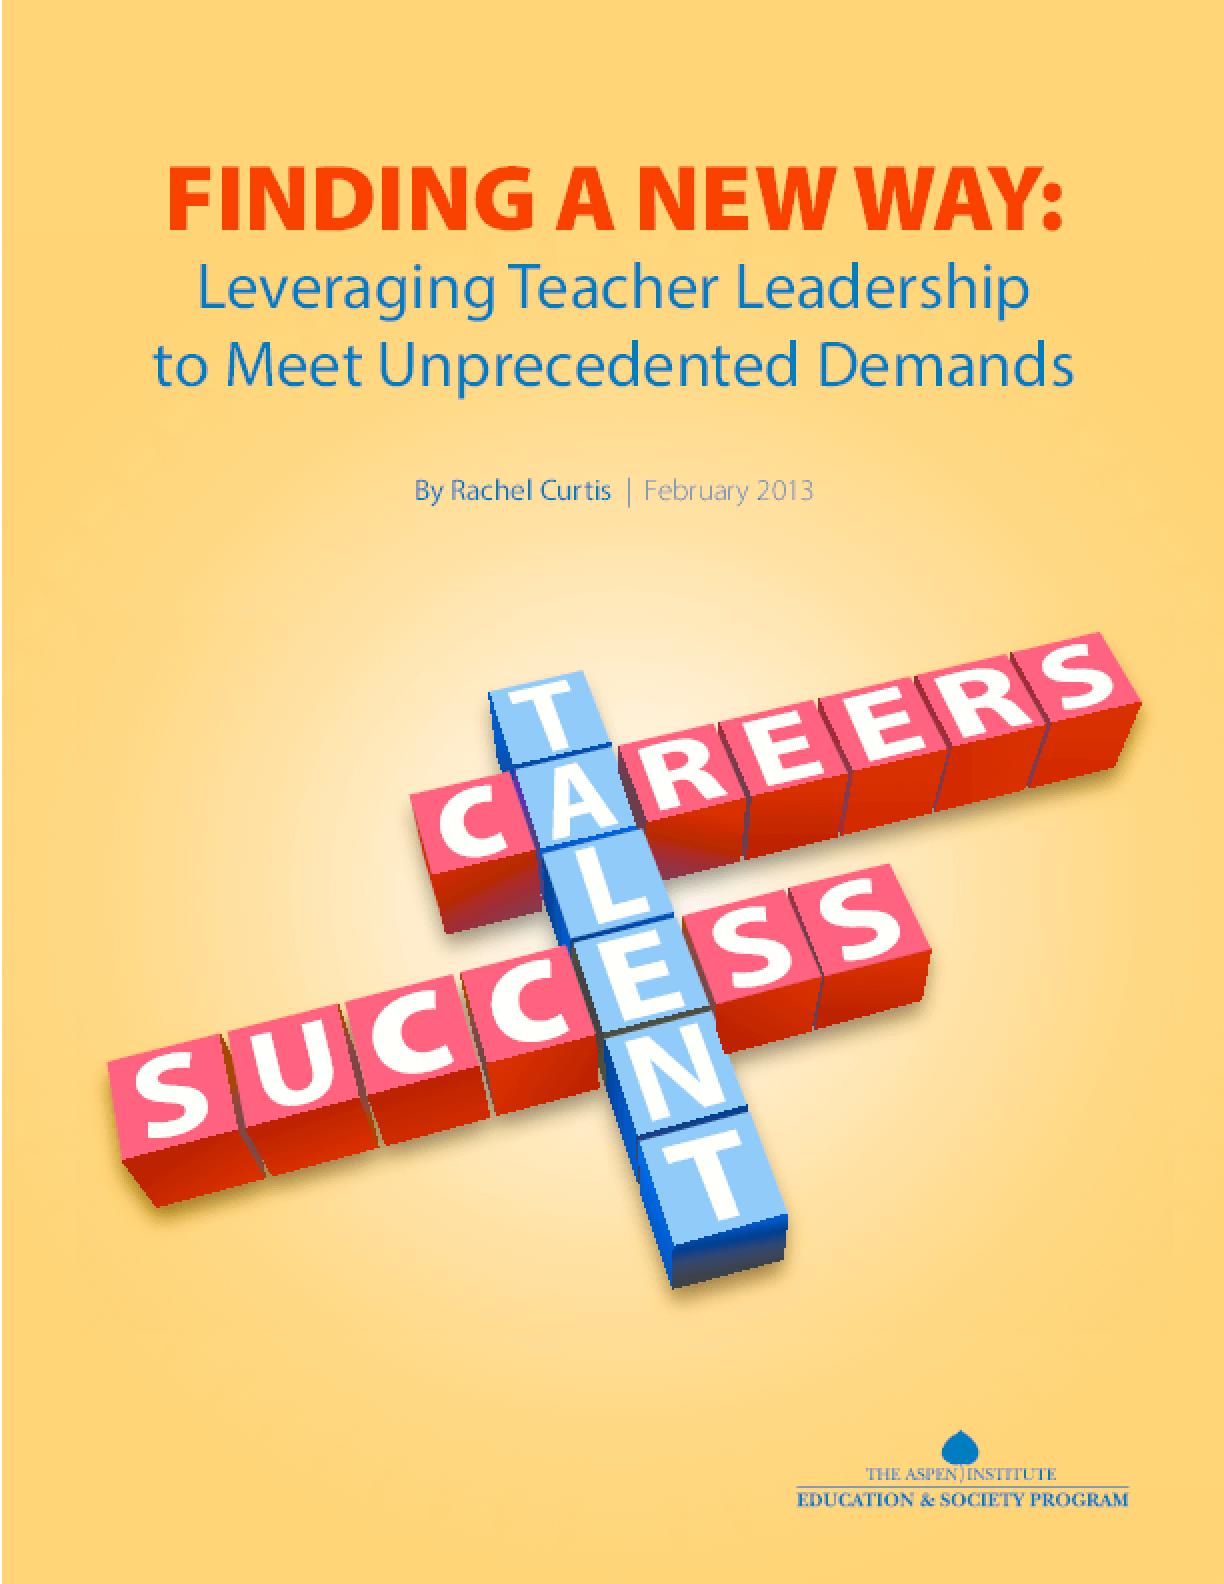 Finding a New Way: Leveraging Teacher Leadership to Meet Unprecedented Demands